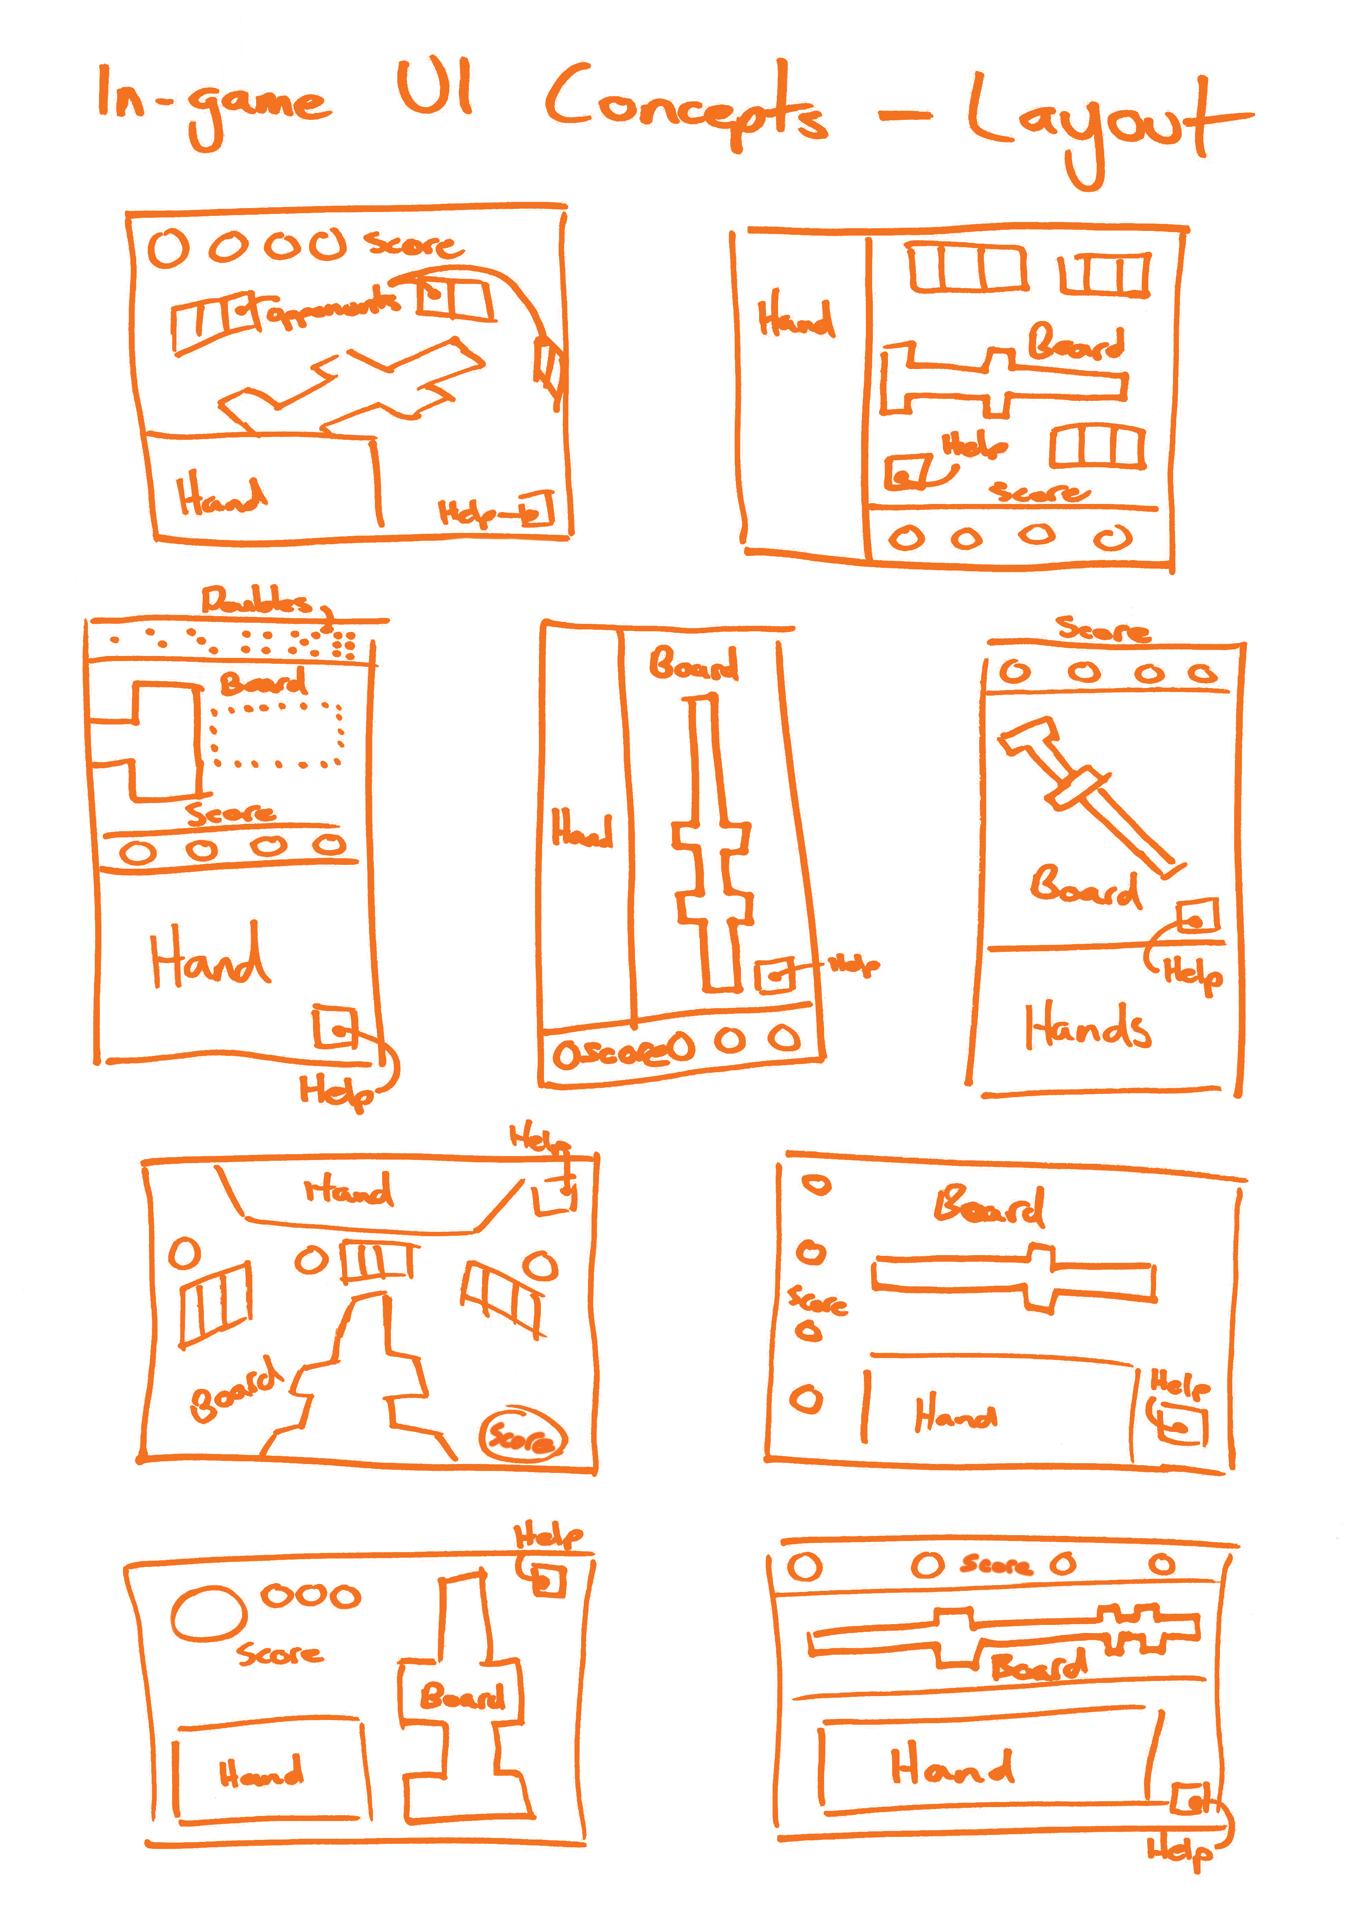 Figure 6.7 - UI Layout Concepts